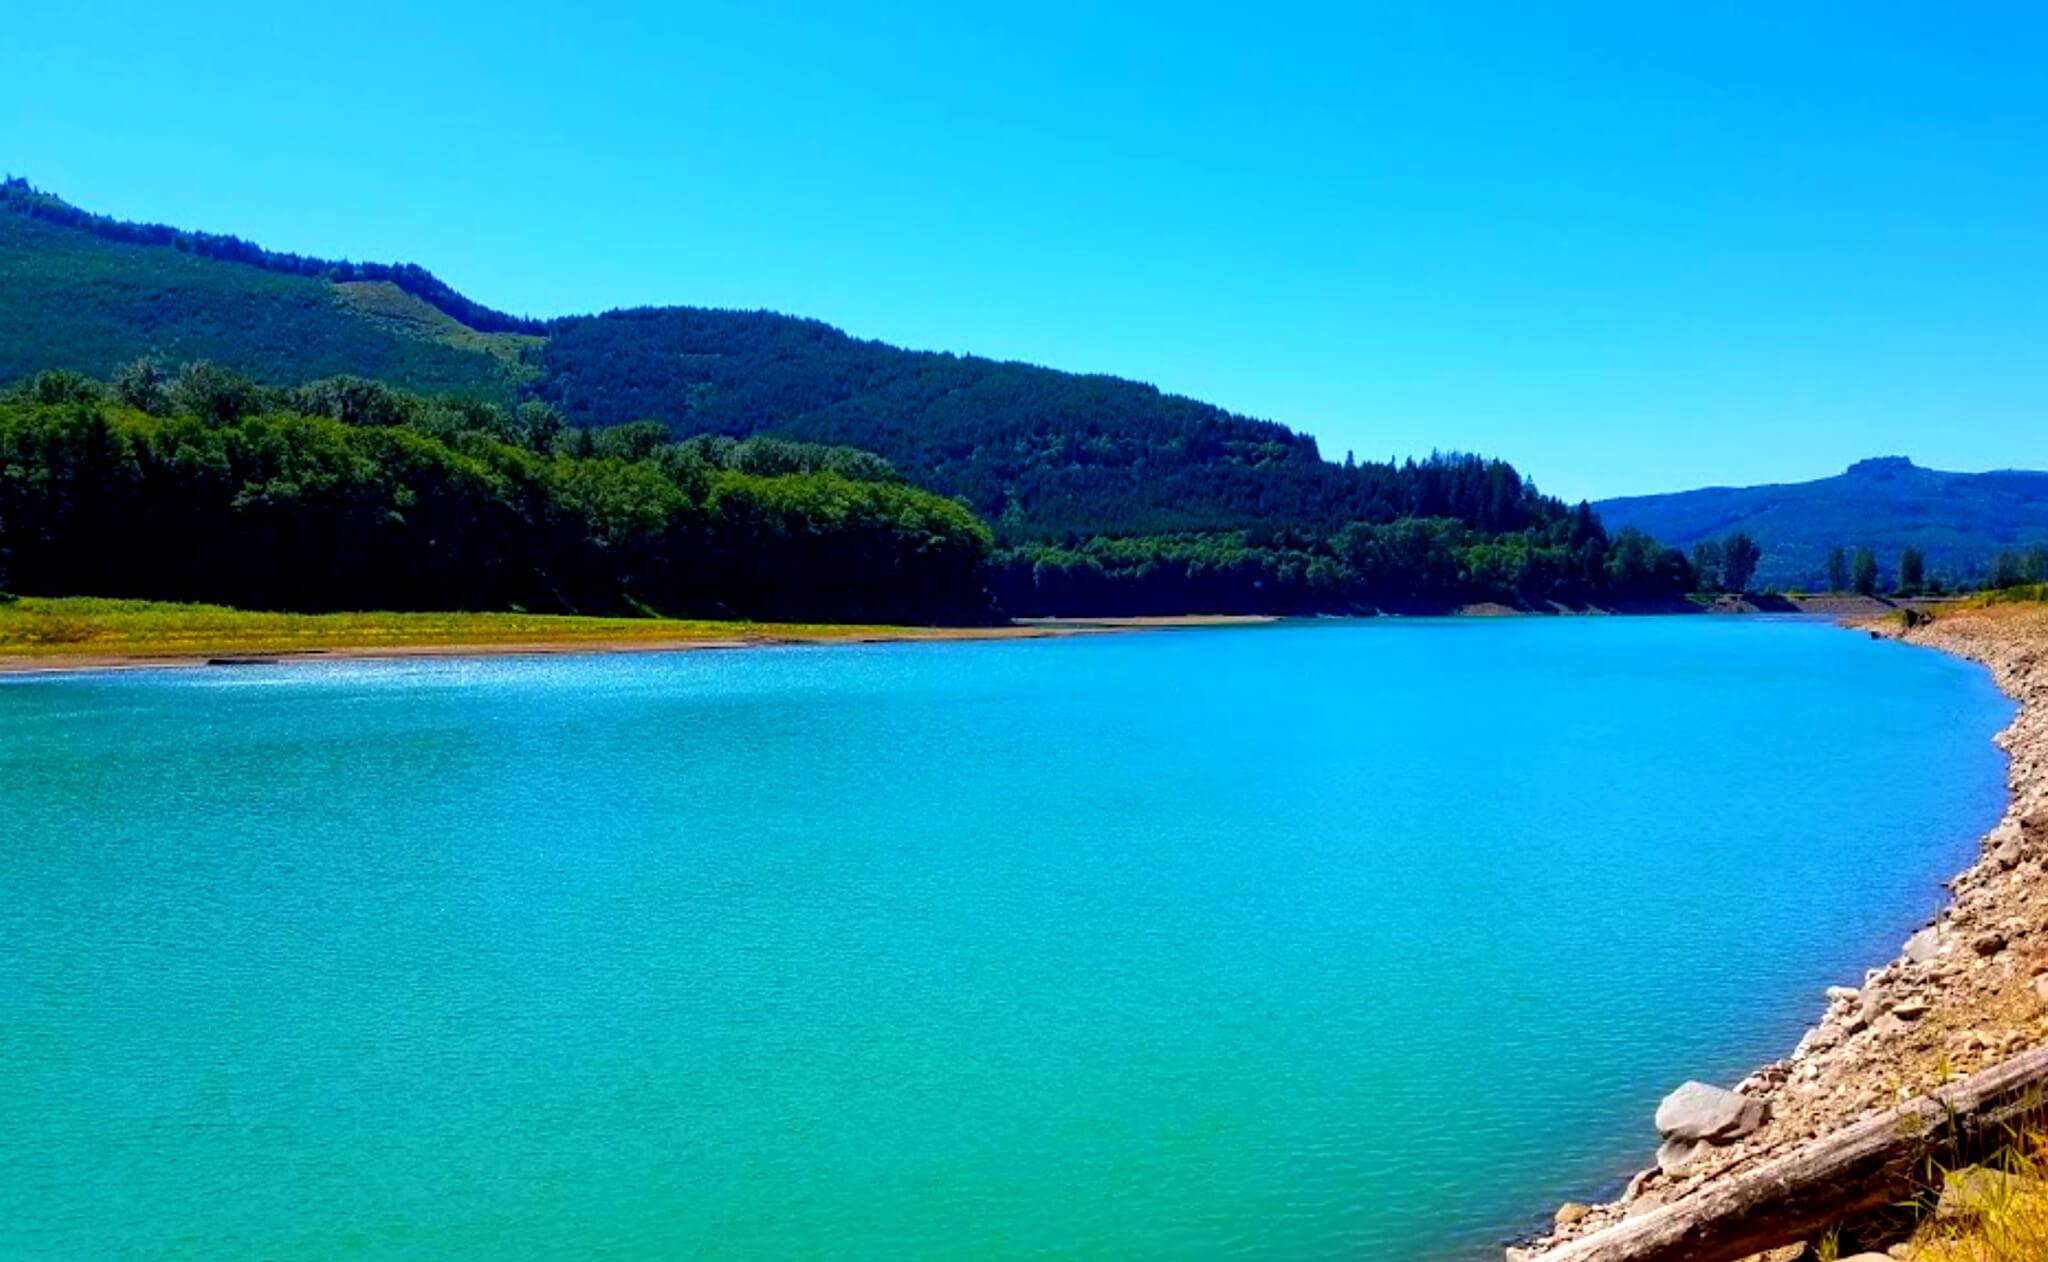 Riffe-Lake-Fishing-Report-Guide-Washington-WA-03